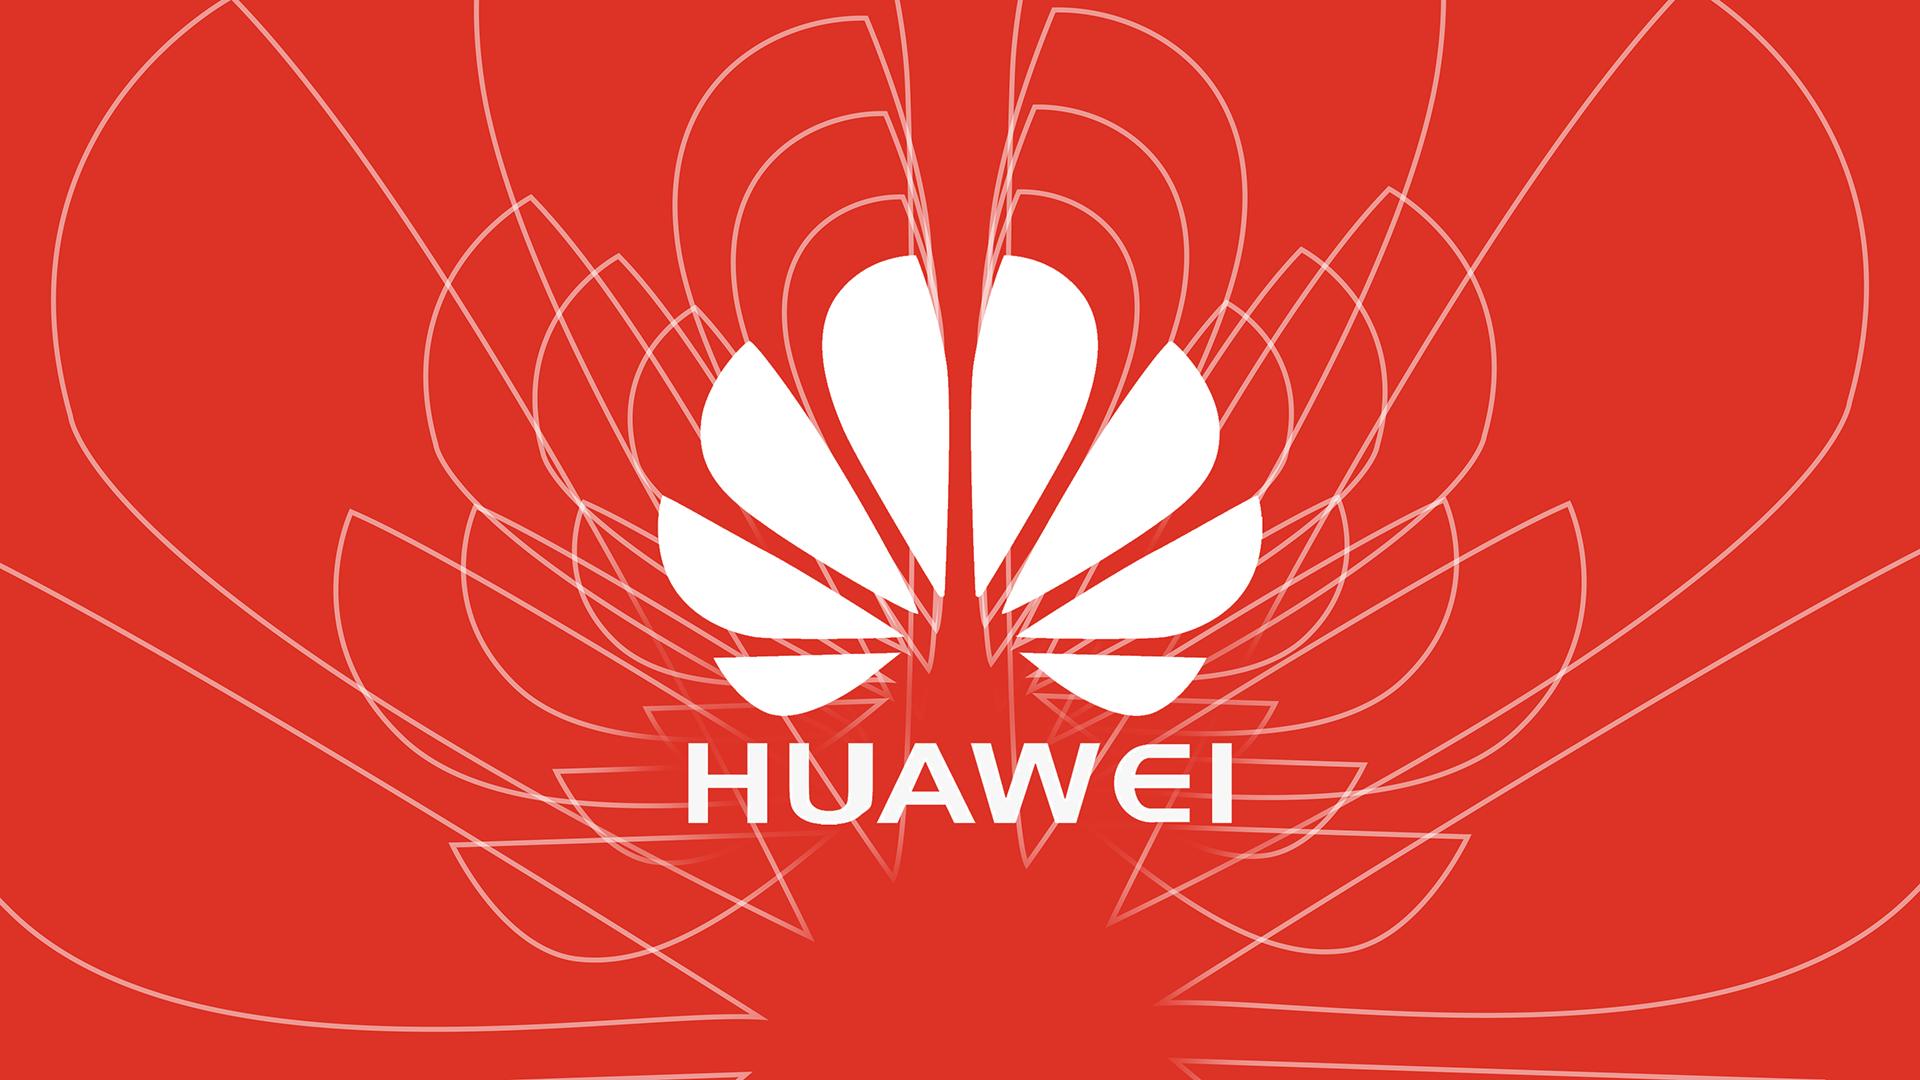 Huawei Logo. Illustration by Umesh Maharjan / E-Nepsters